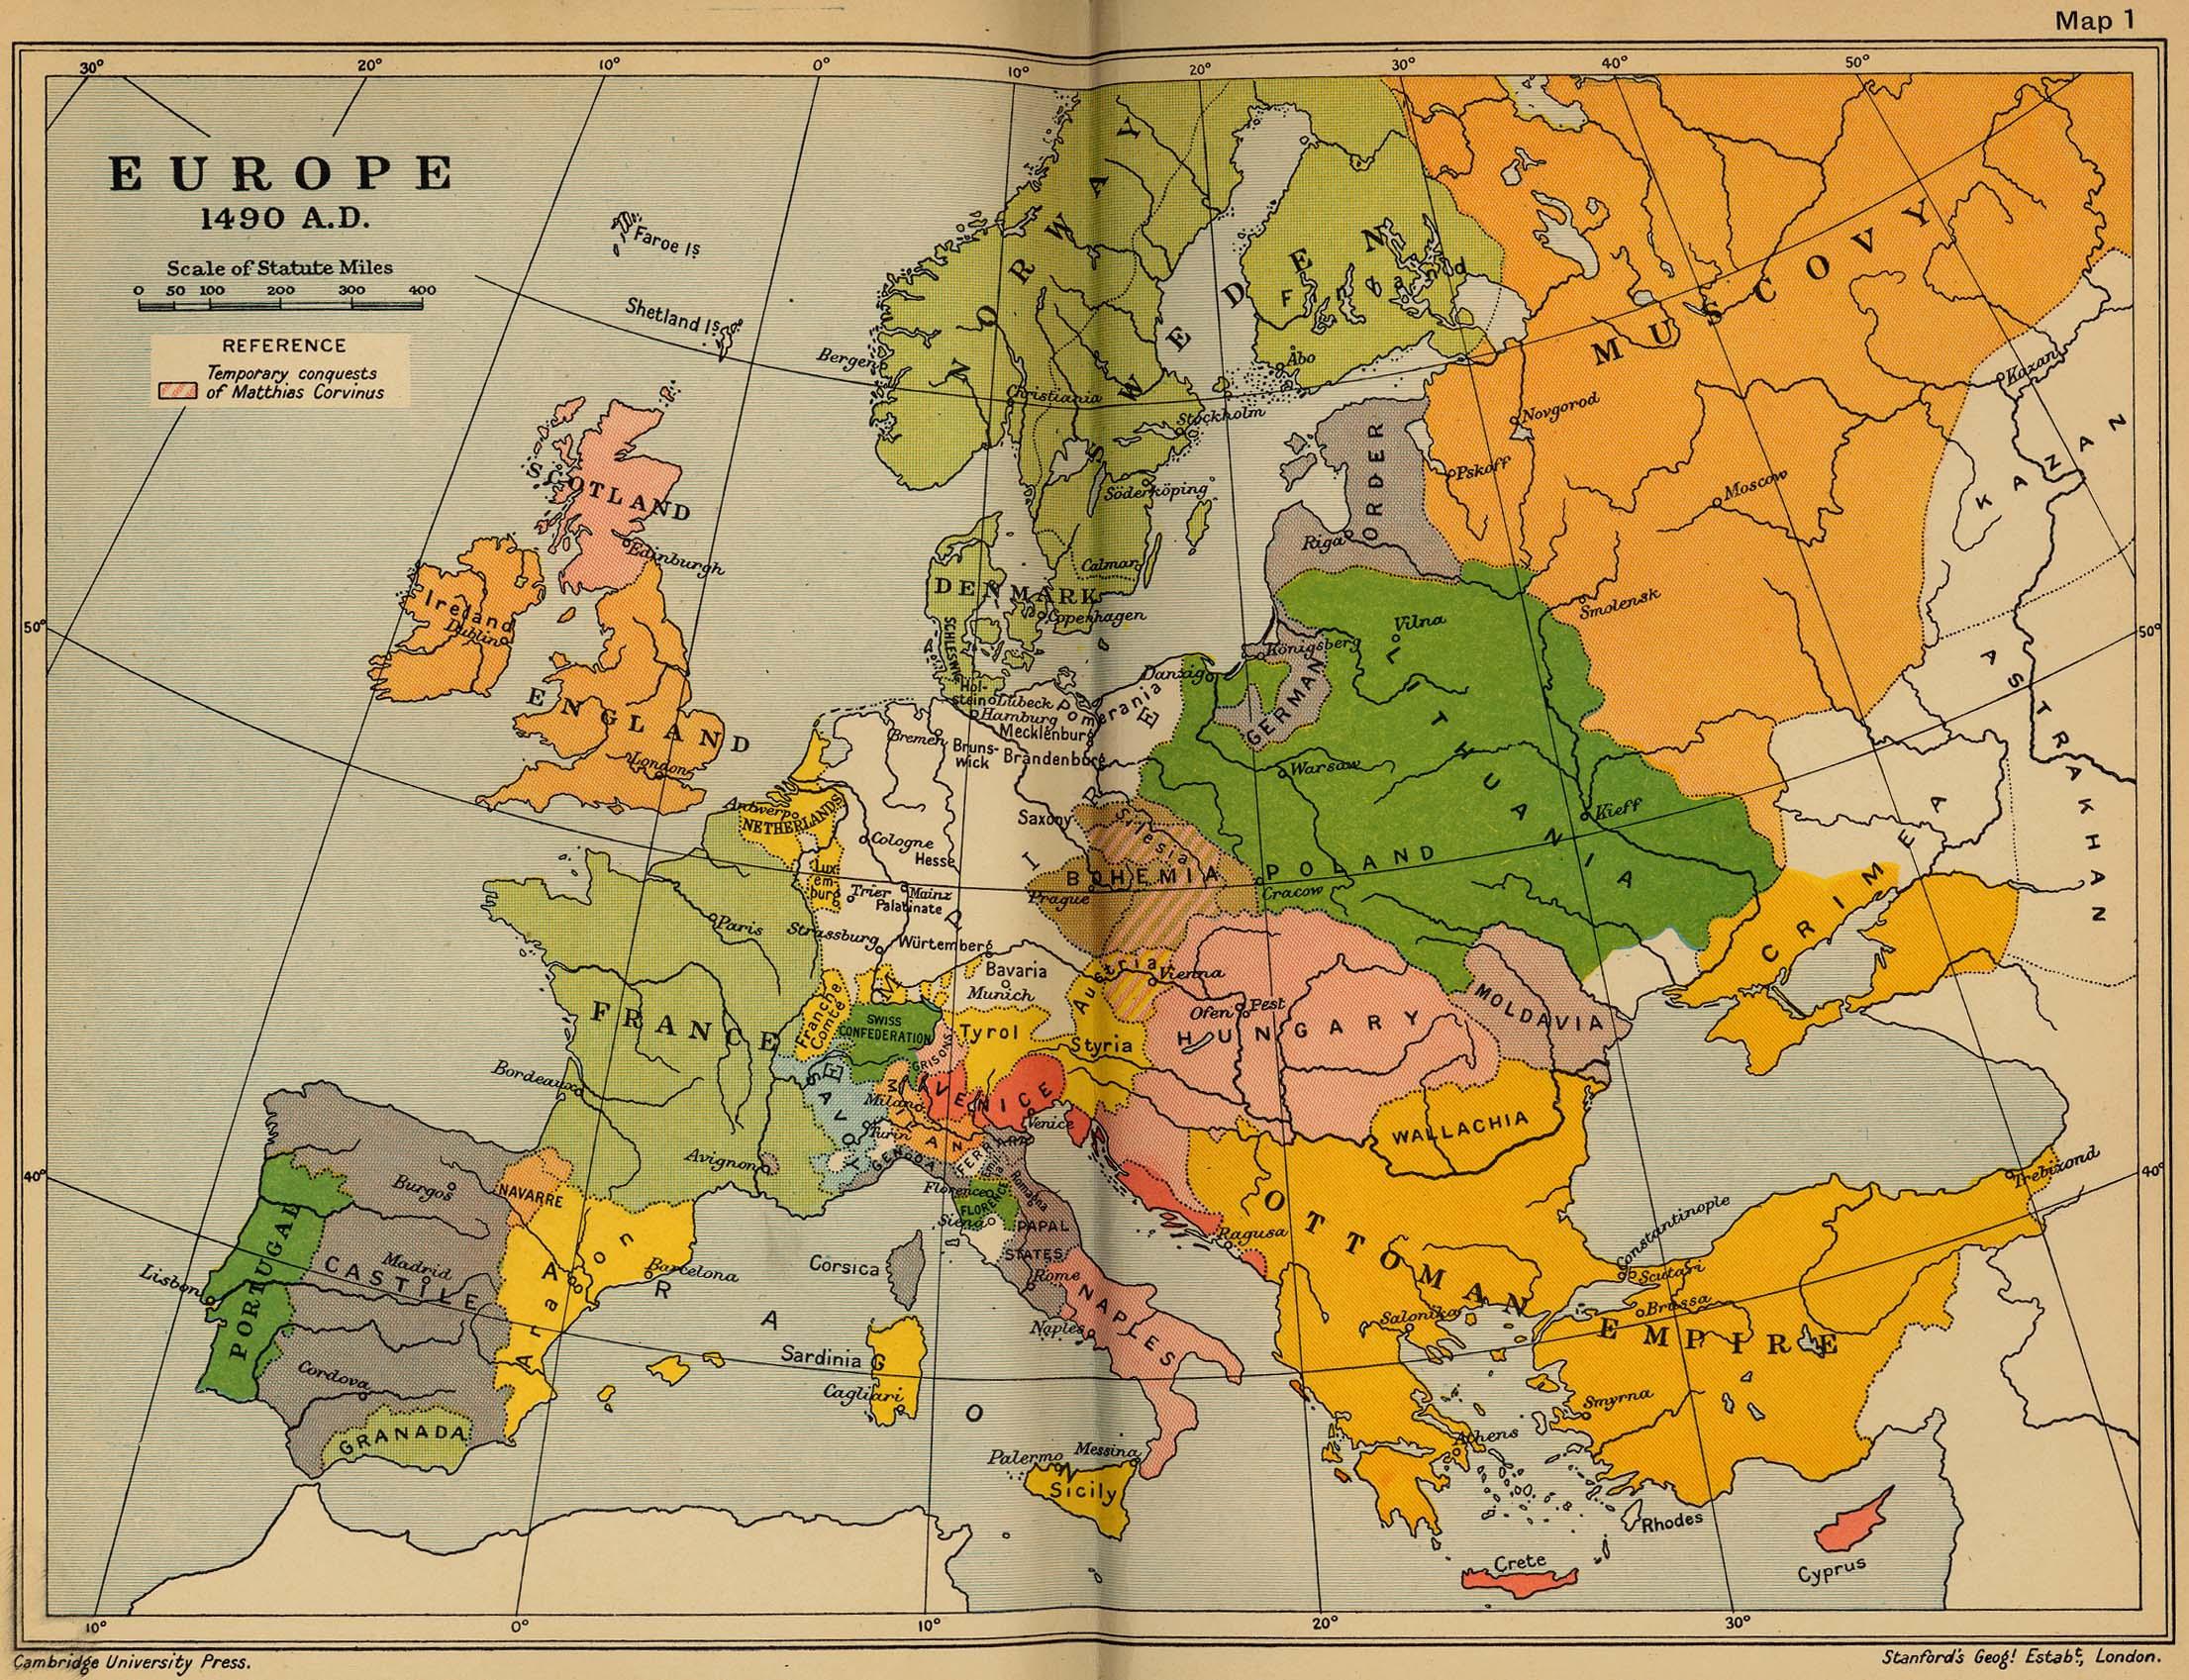 Texas Vs Europe Map.Europe 1490 Cosmolearning History